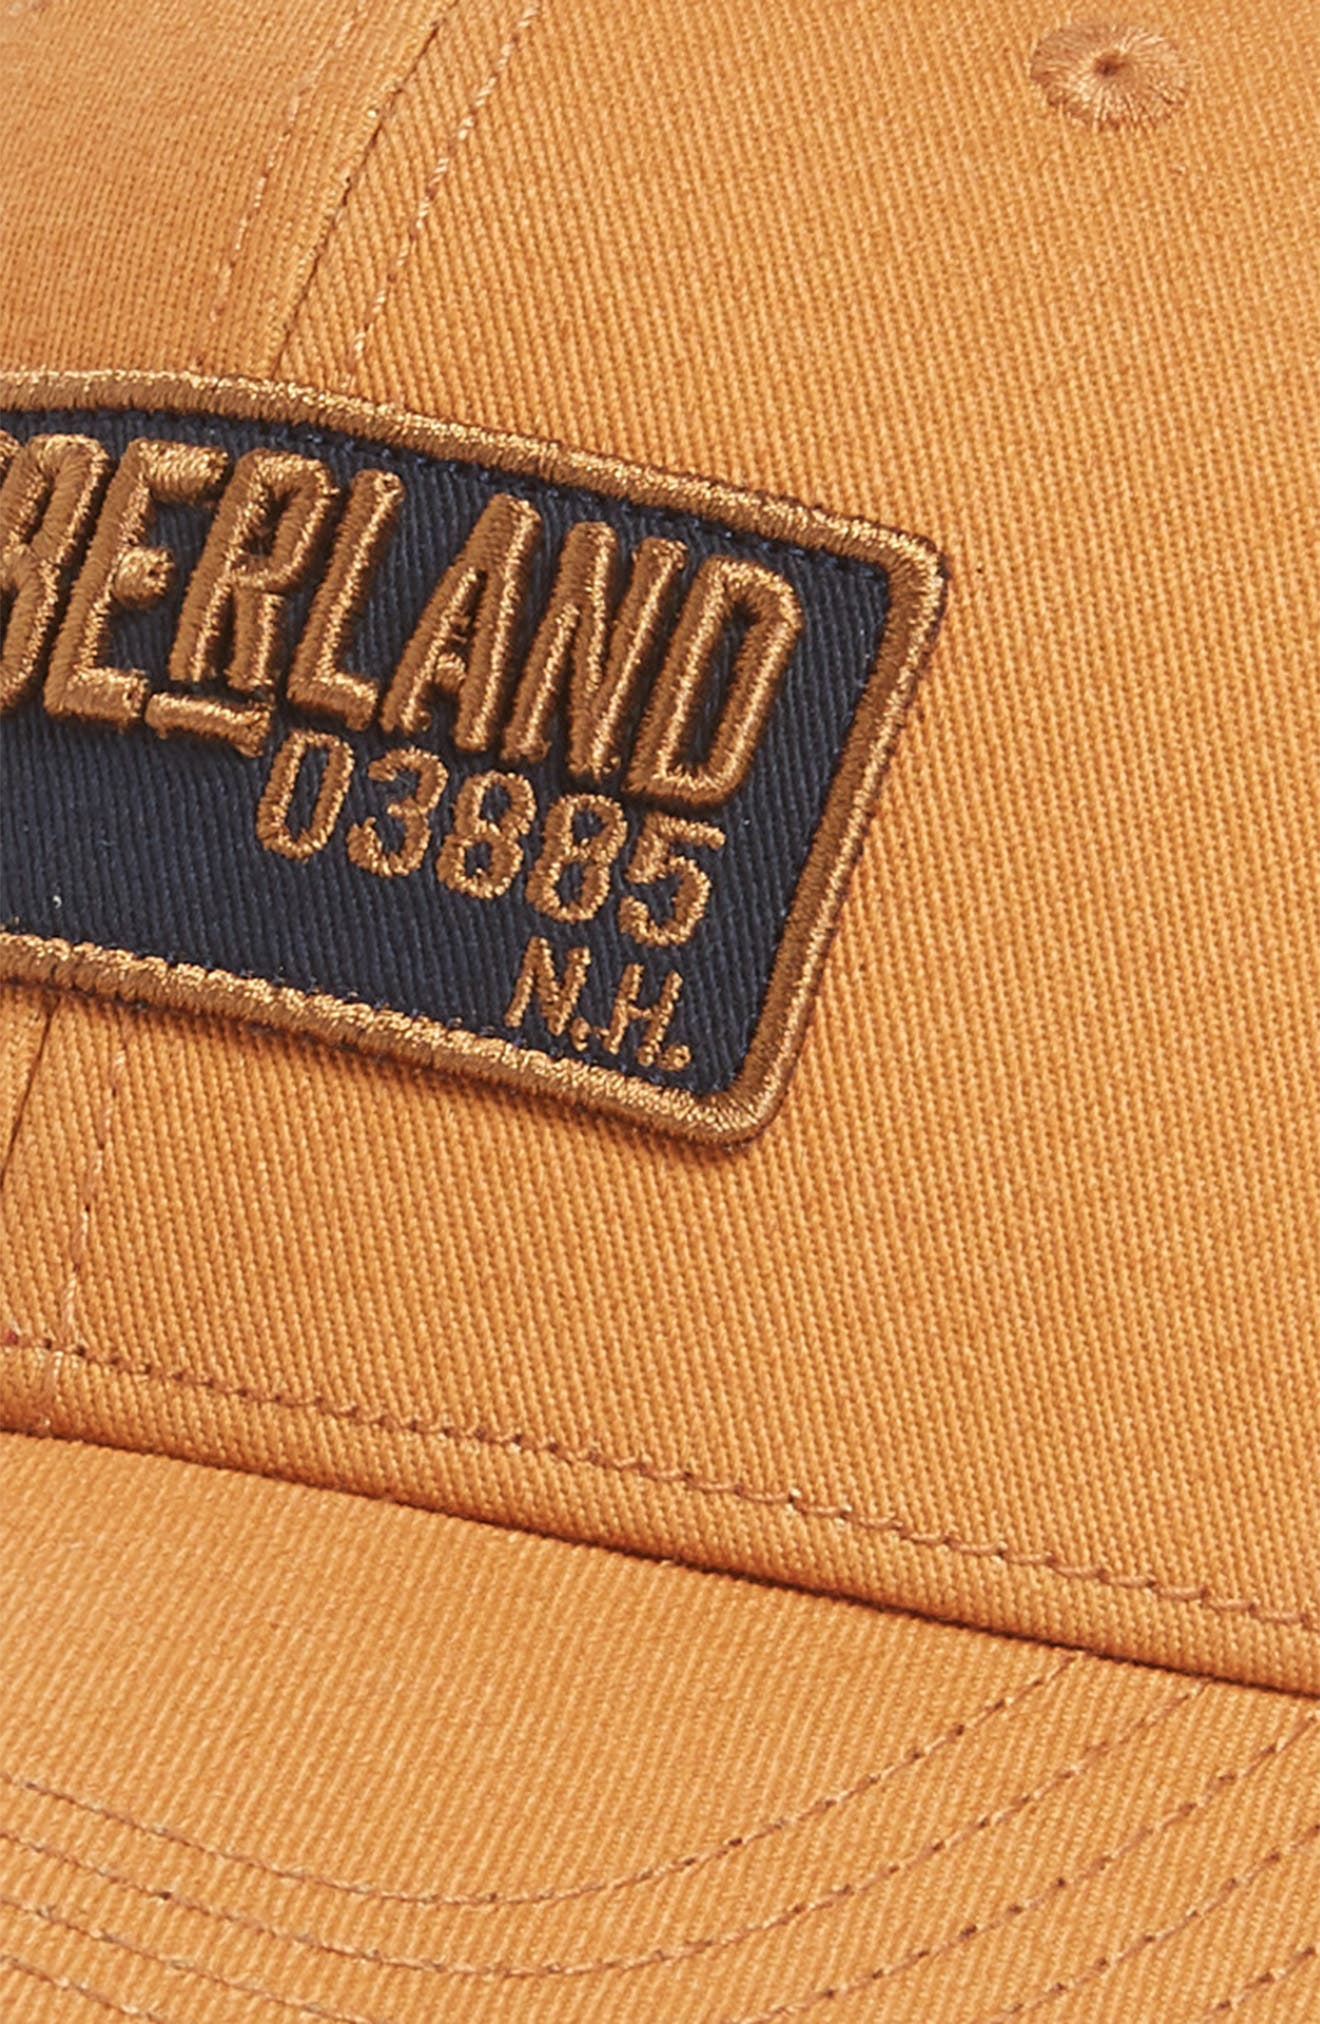 TIMBERLAND,                             Kittery Baseball Cap,                             Alternate thumbnail 3, color,                             WHEAT